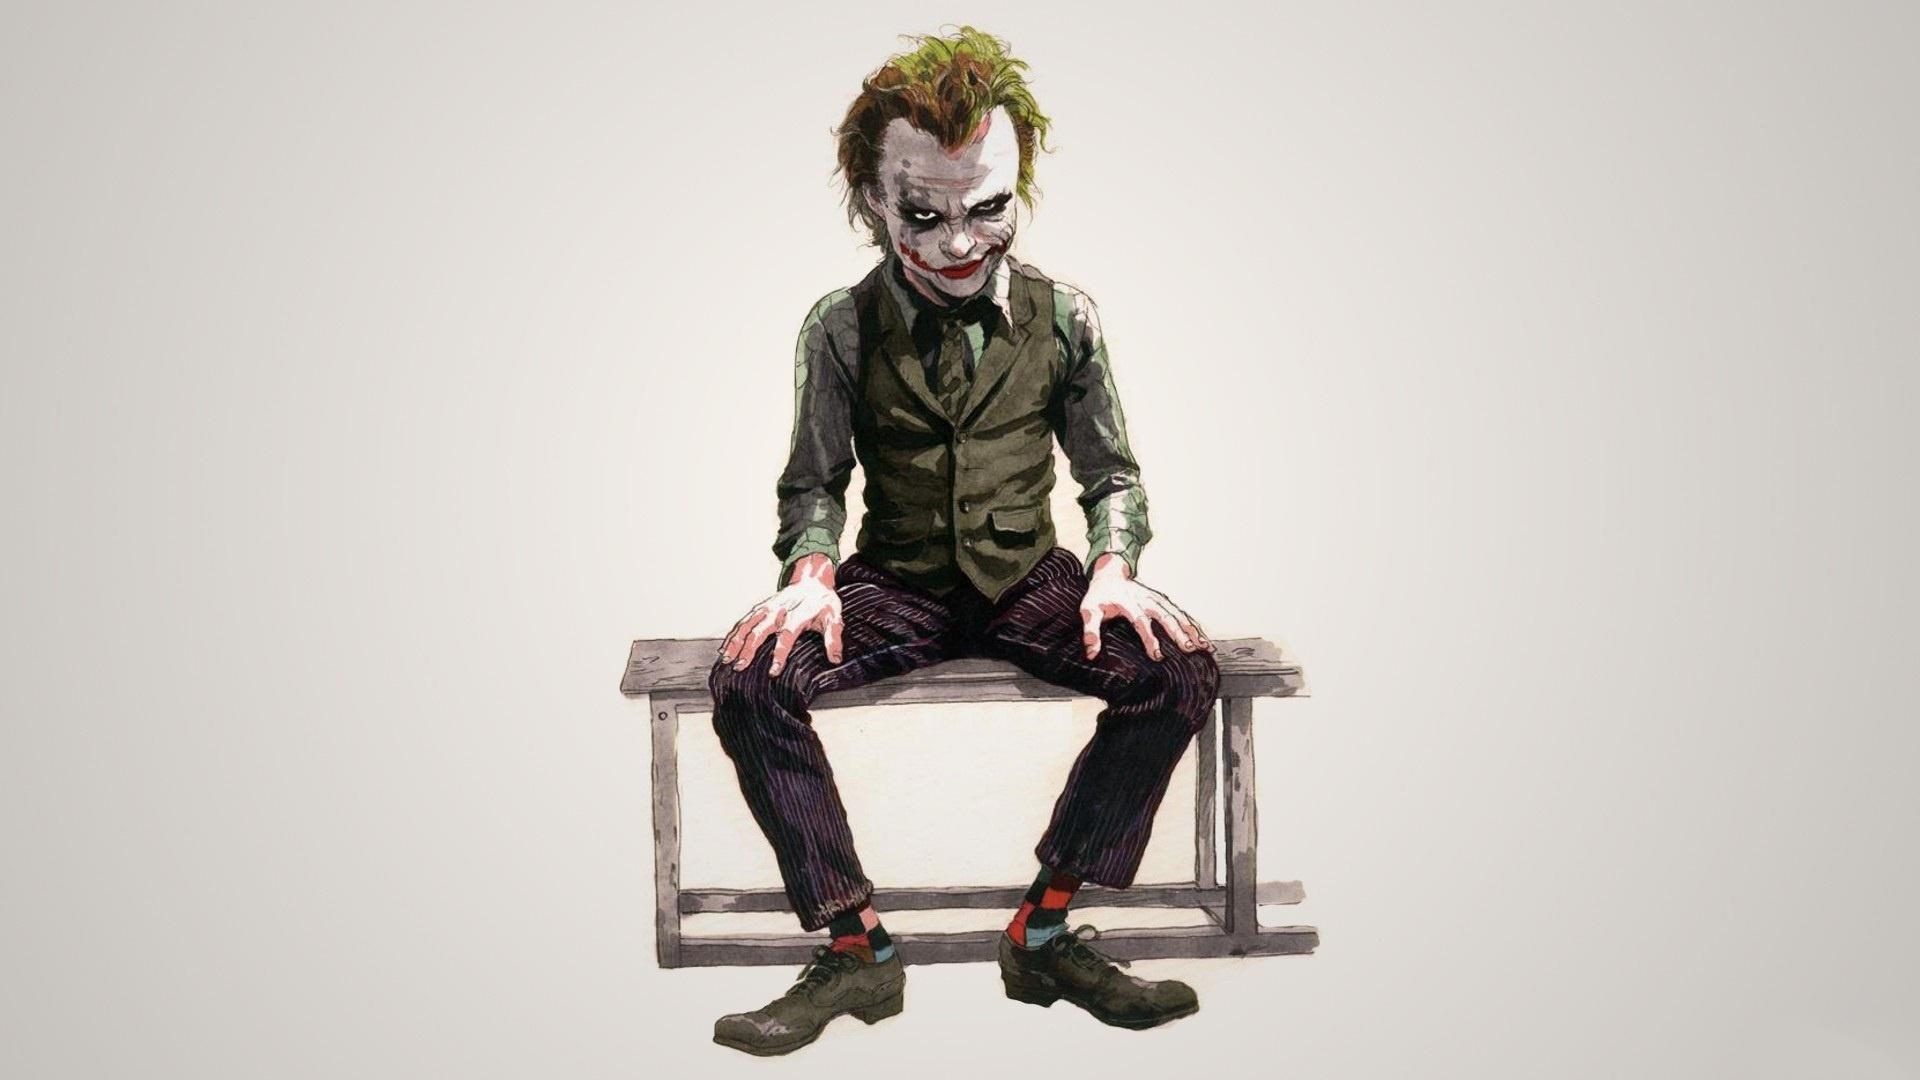 Hd wallpaper evil - Evil Joker Hd Wallpaper 1920 1080 24138 Hd Wallpaper Res 1920x1080